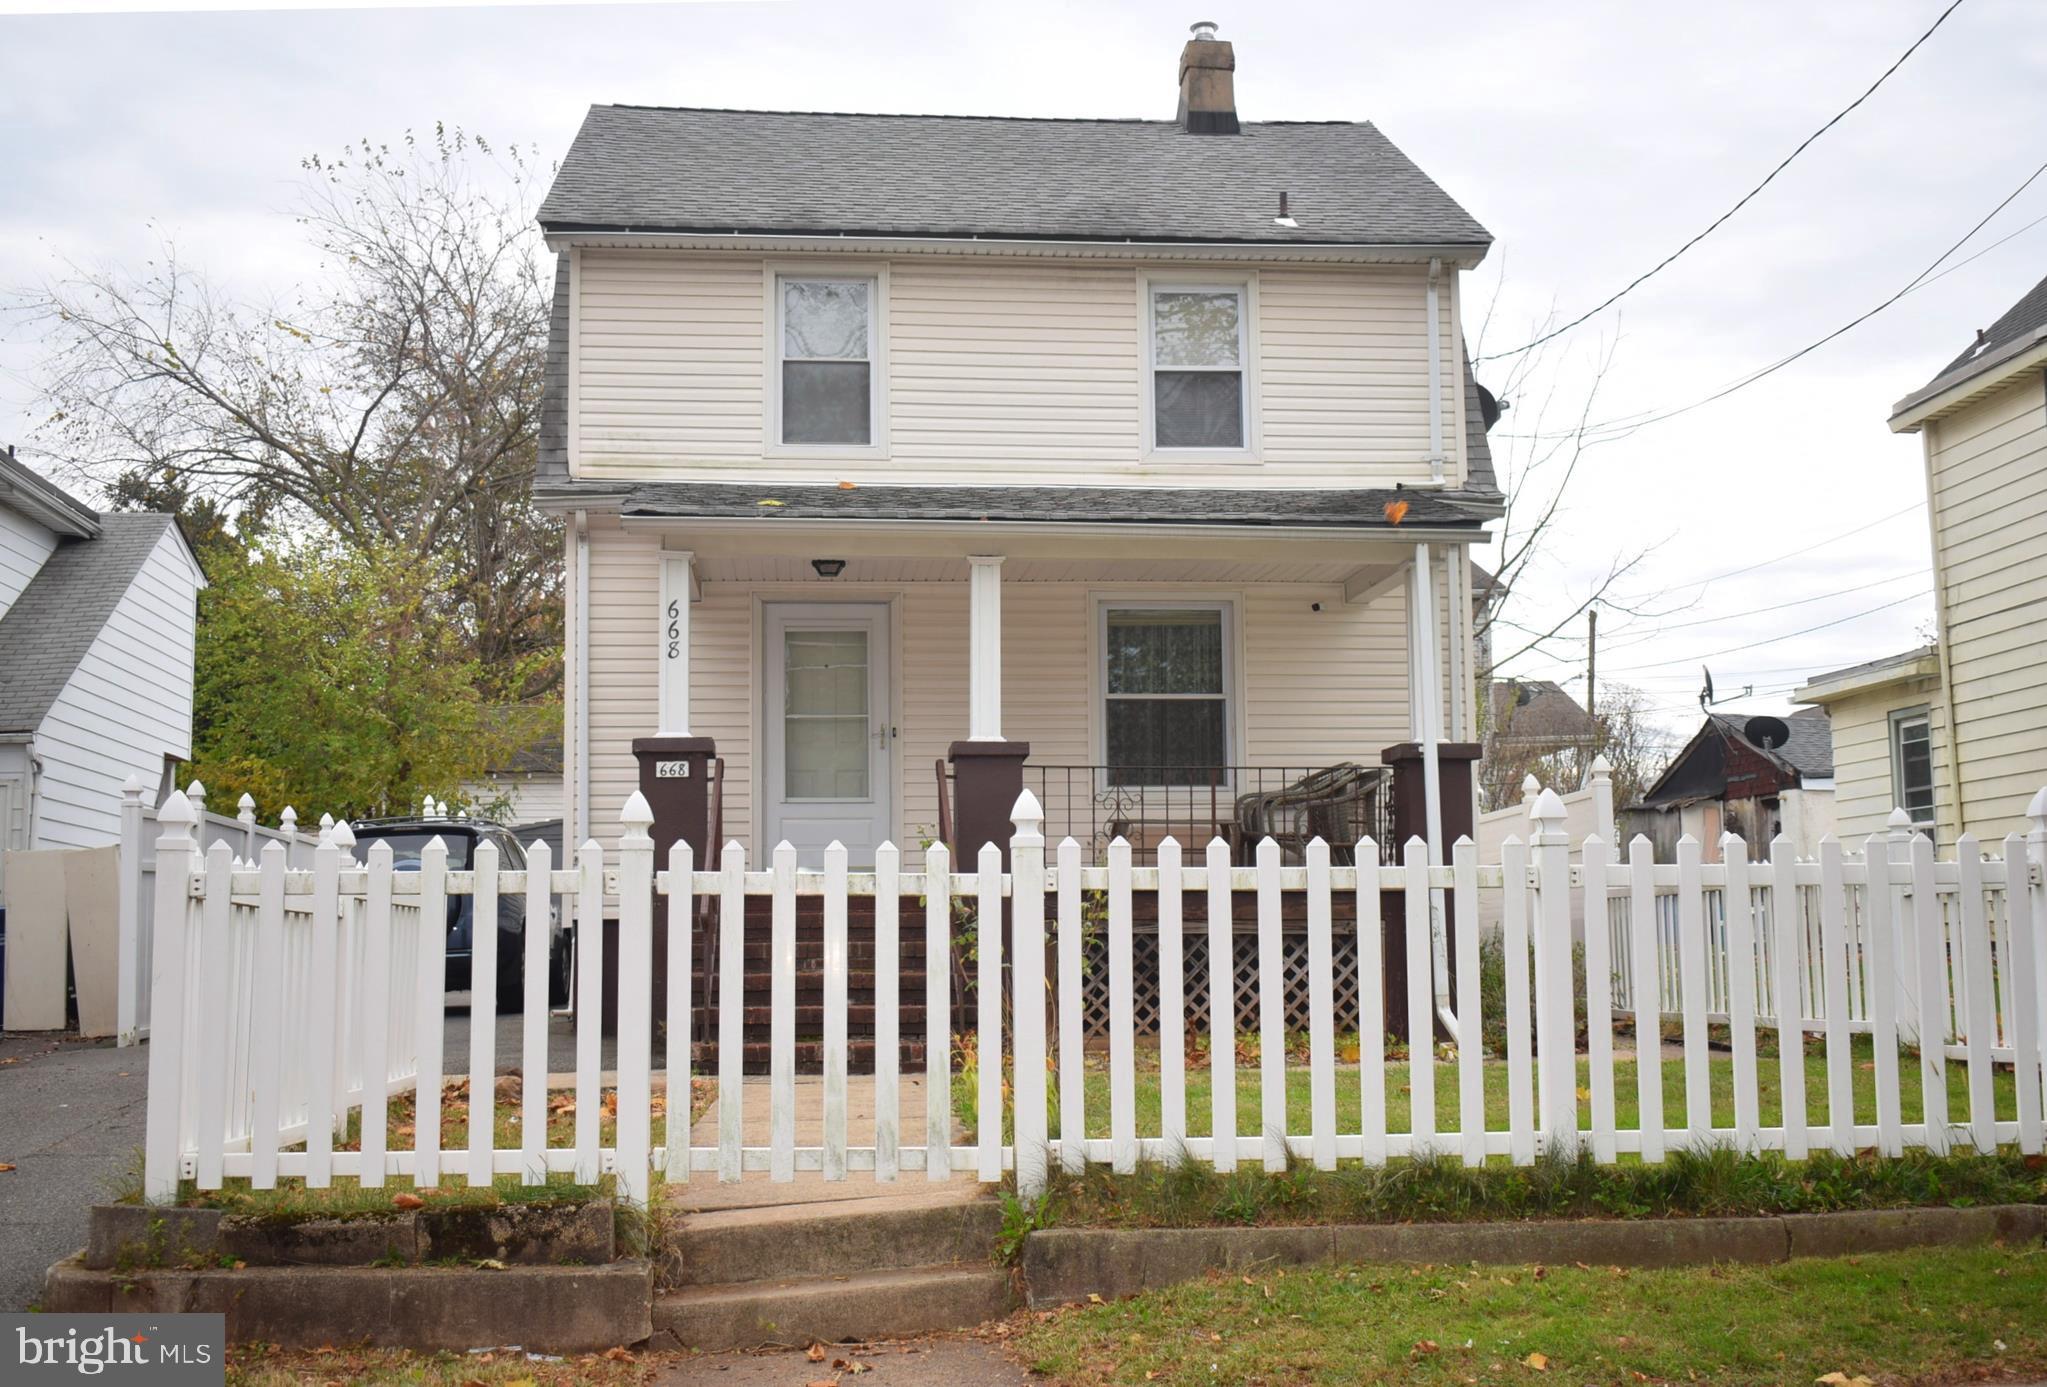 668 LIVINGSTON AVENUE, NORTH BRUNSWICK, NJ 08902